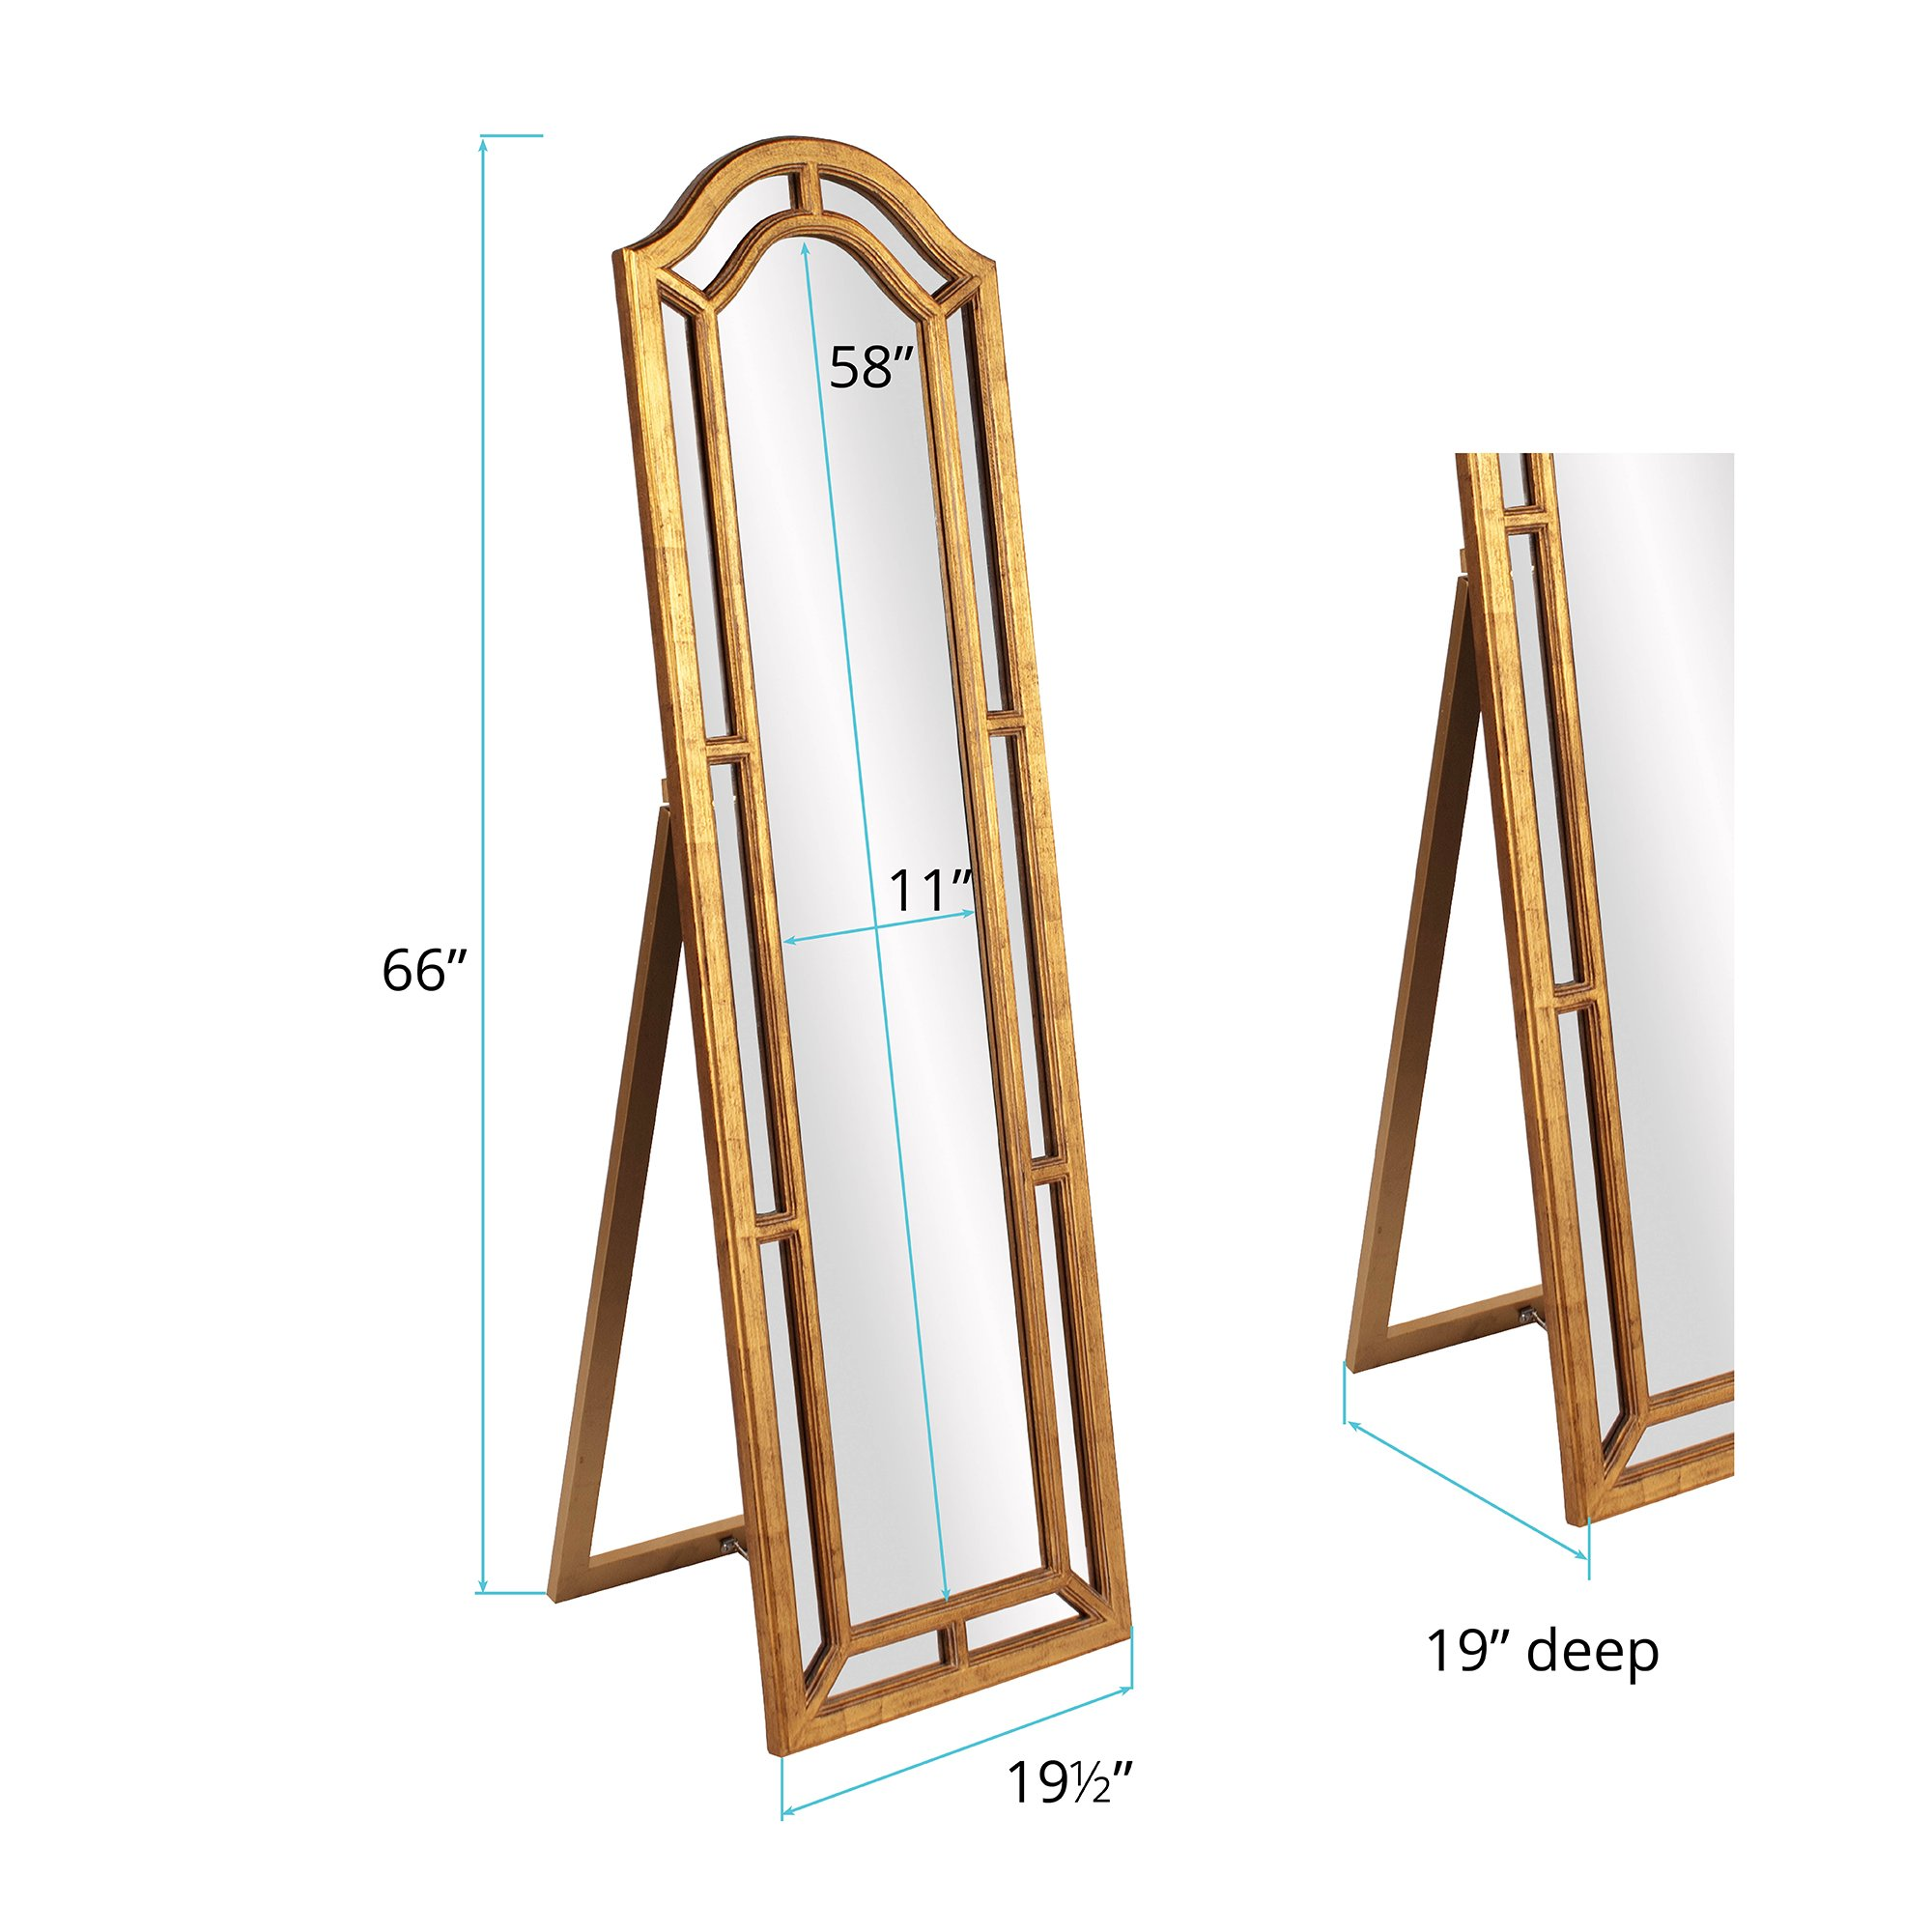 Howard Elliott 56144 Mark Standing Mirror, Gold by Howard Elliott Collection (Image #2)